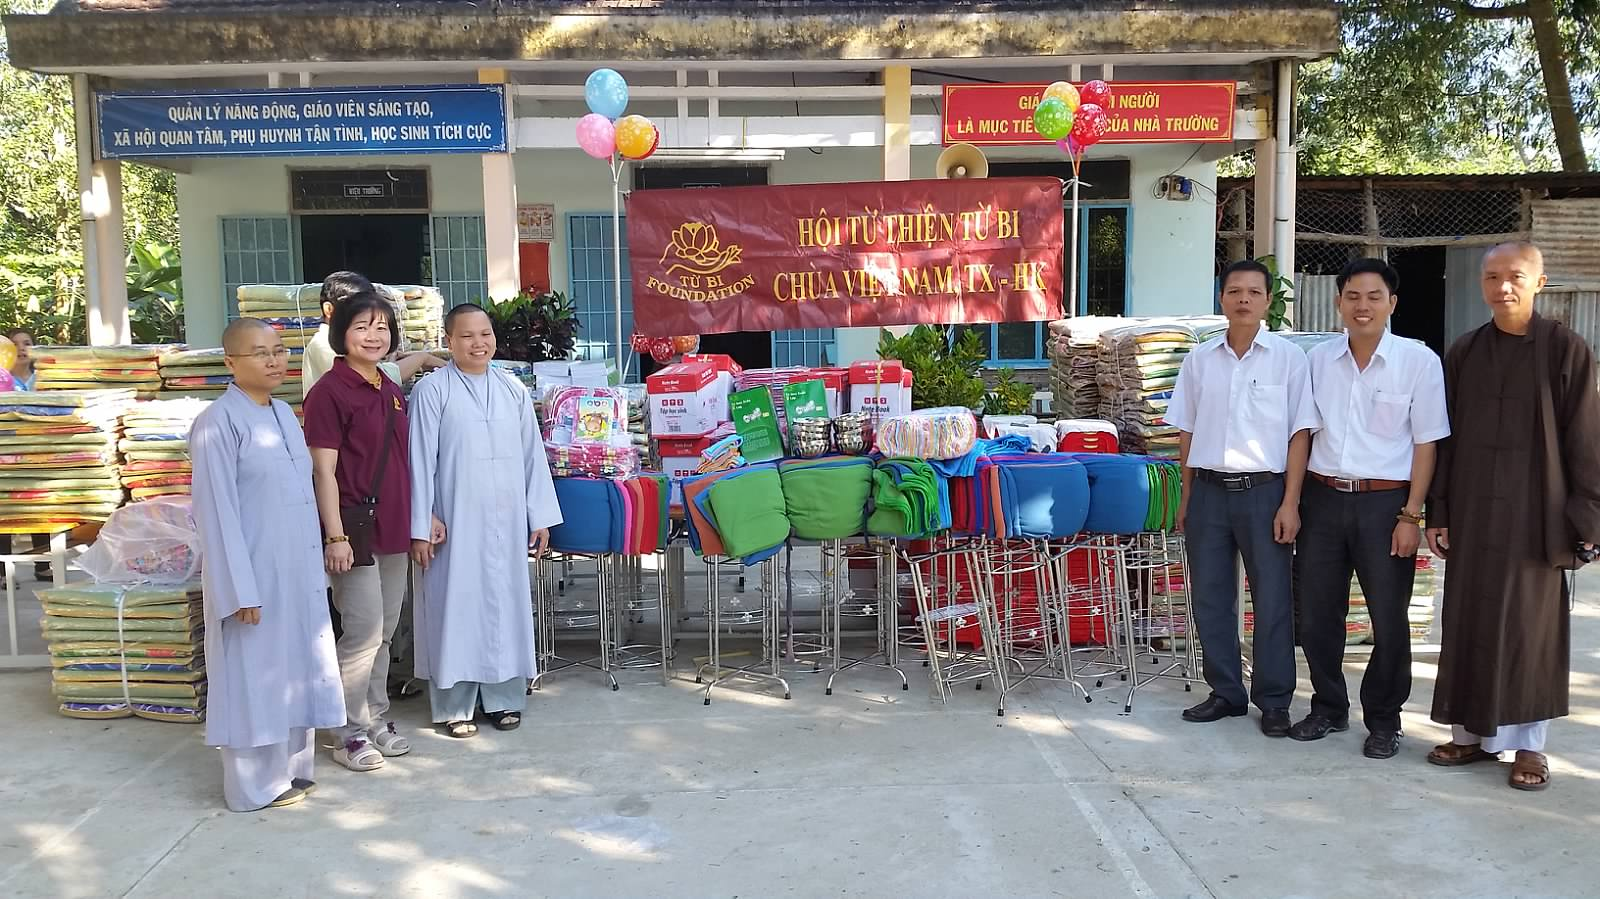 TQ Tieu Hoc Khanh Thuong 08